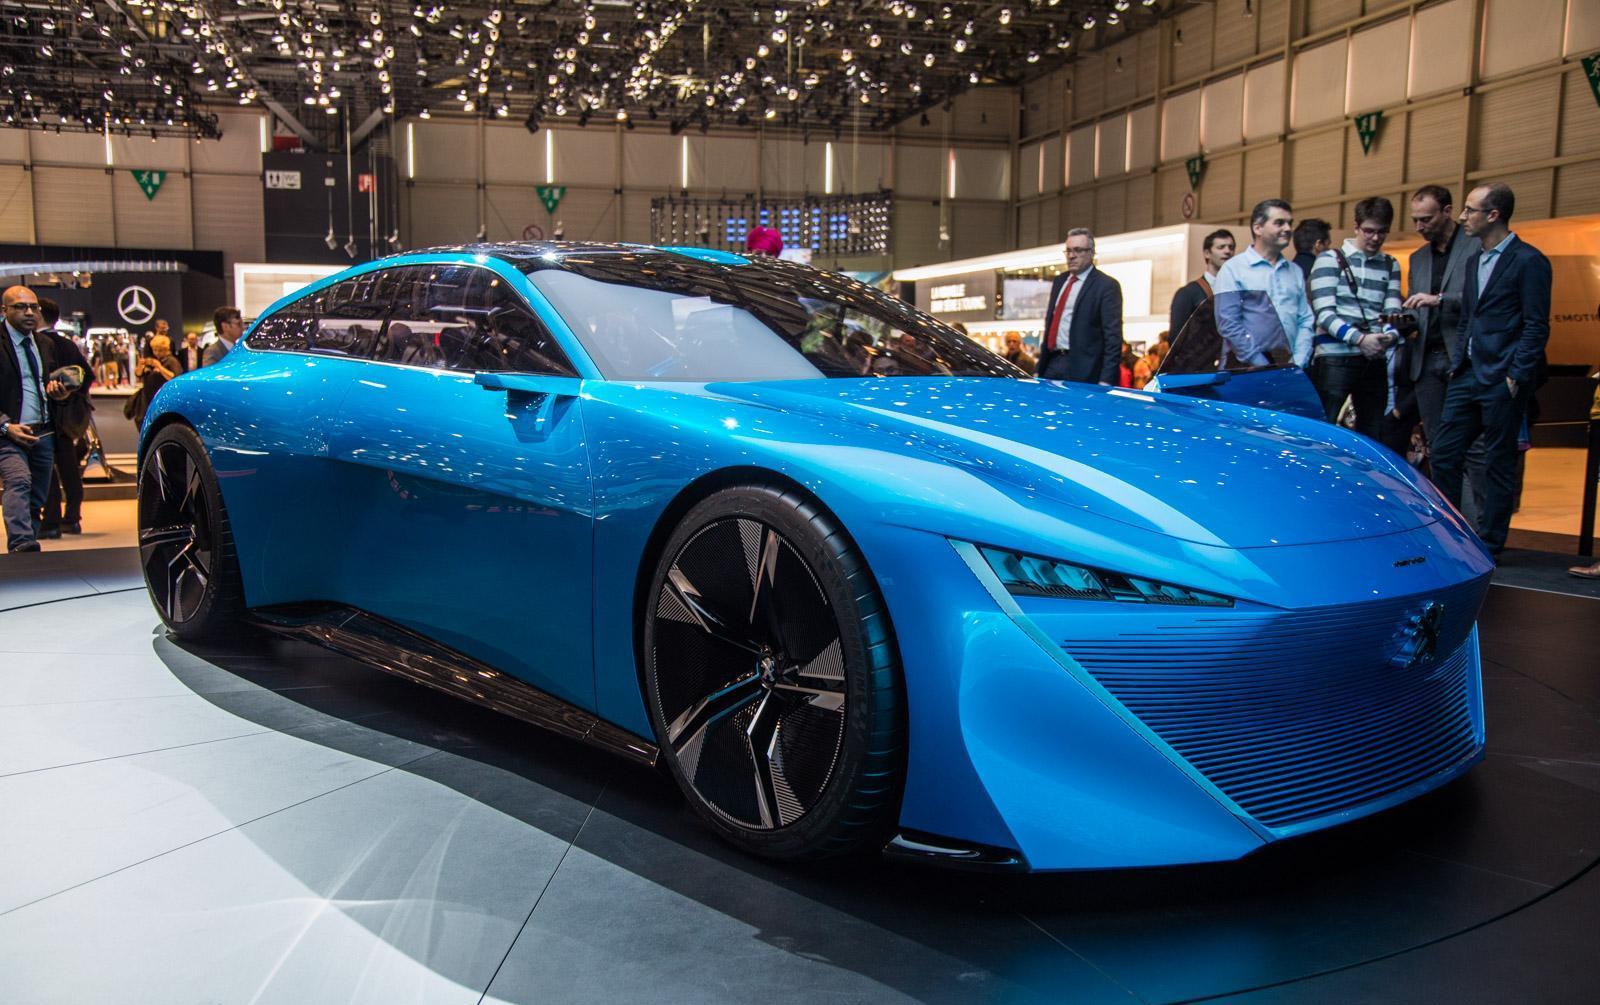 Peugeot-instinct-concept-003